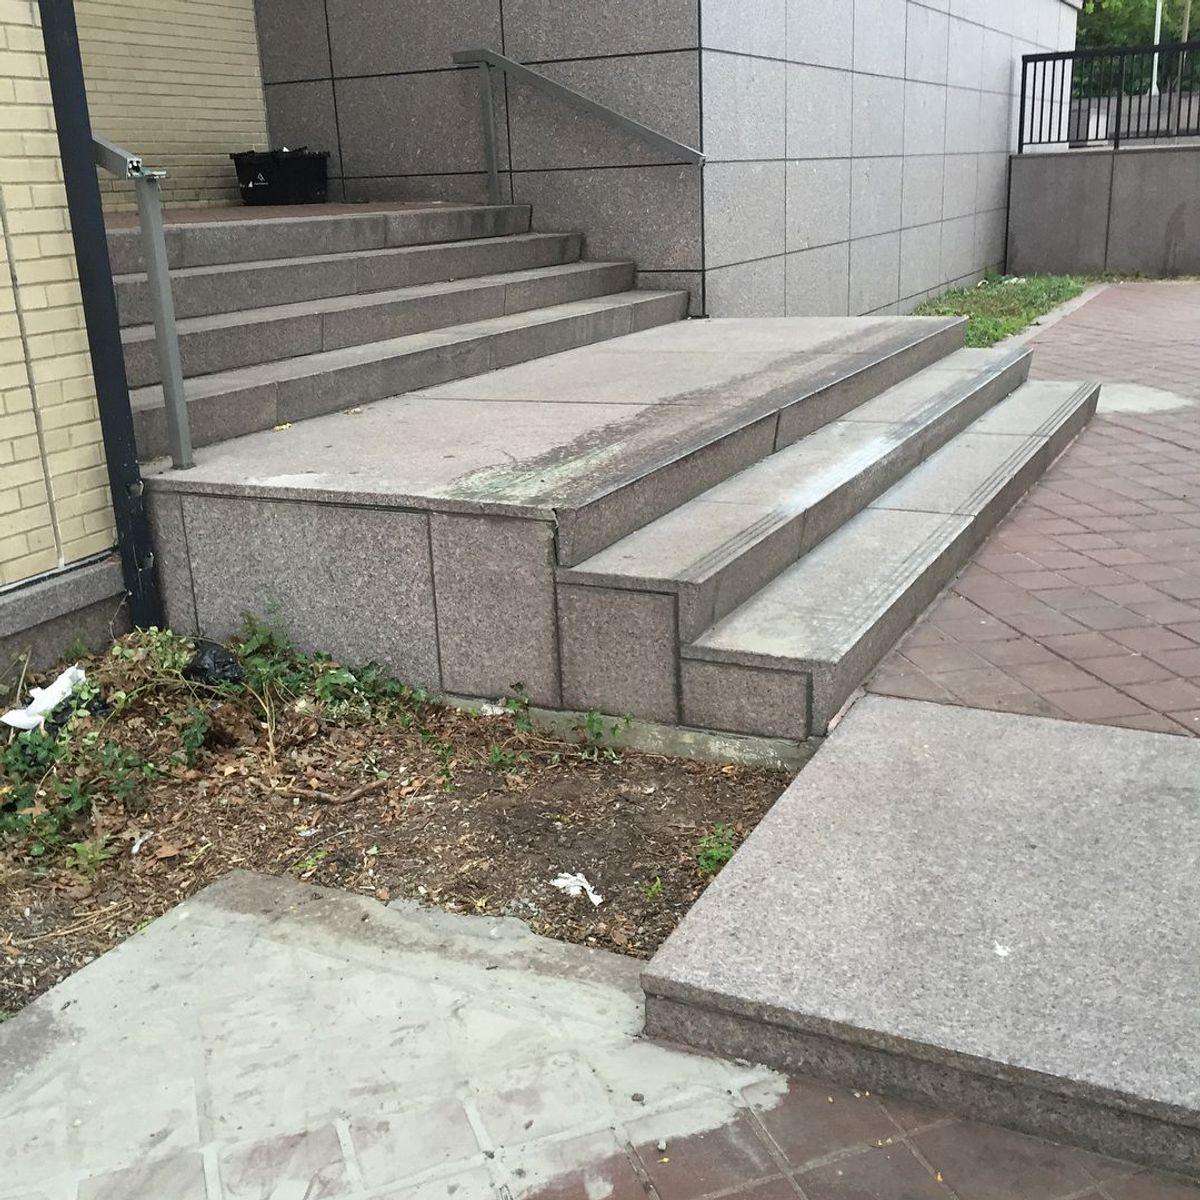 Image for skate spot Social Security